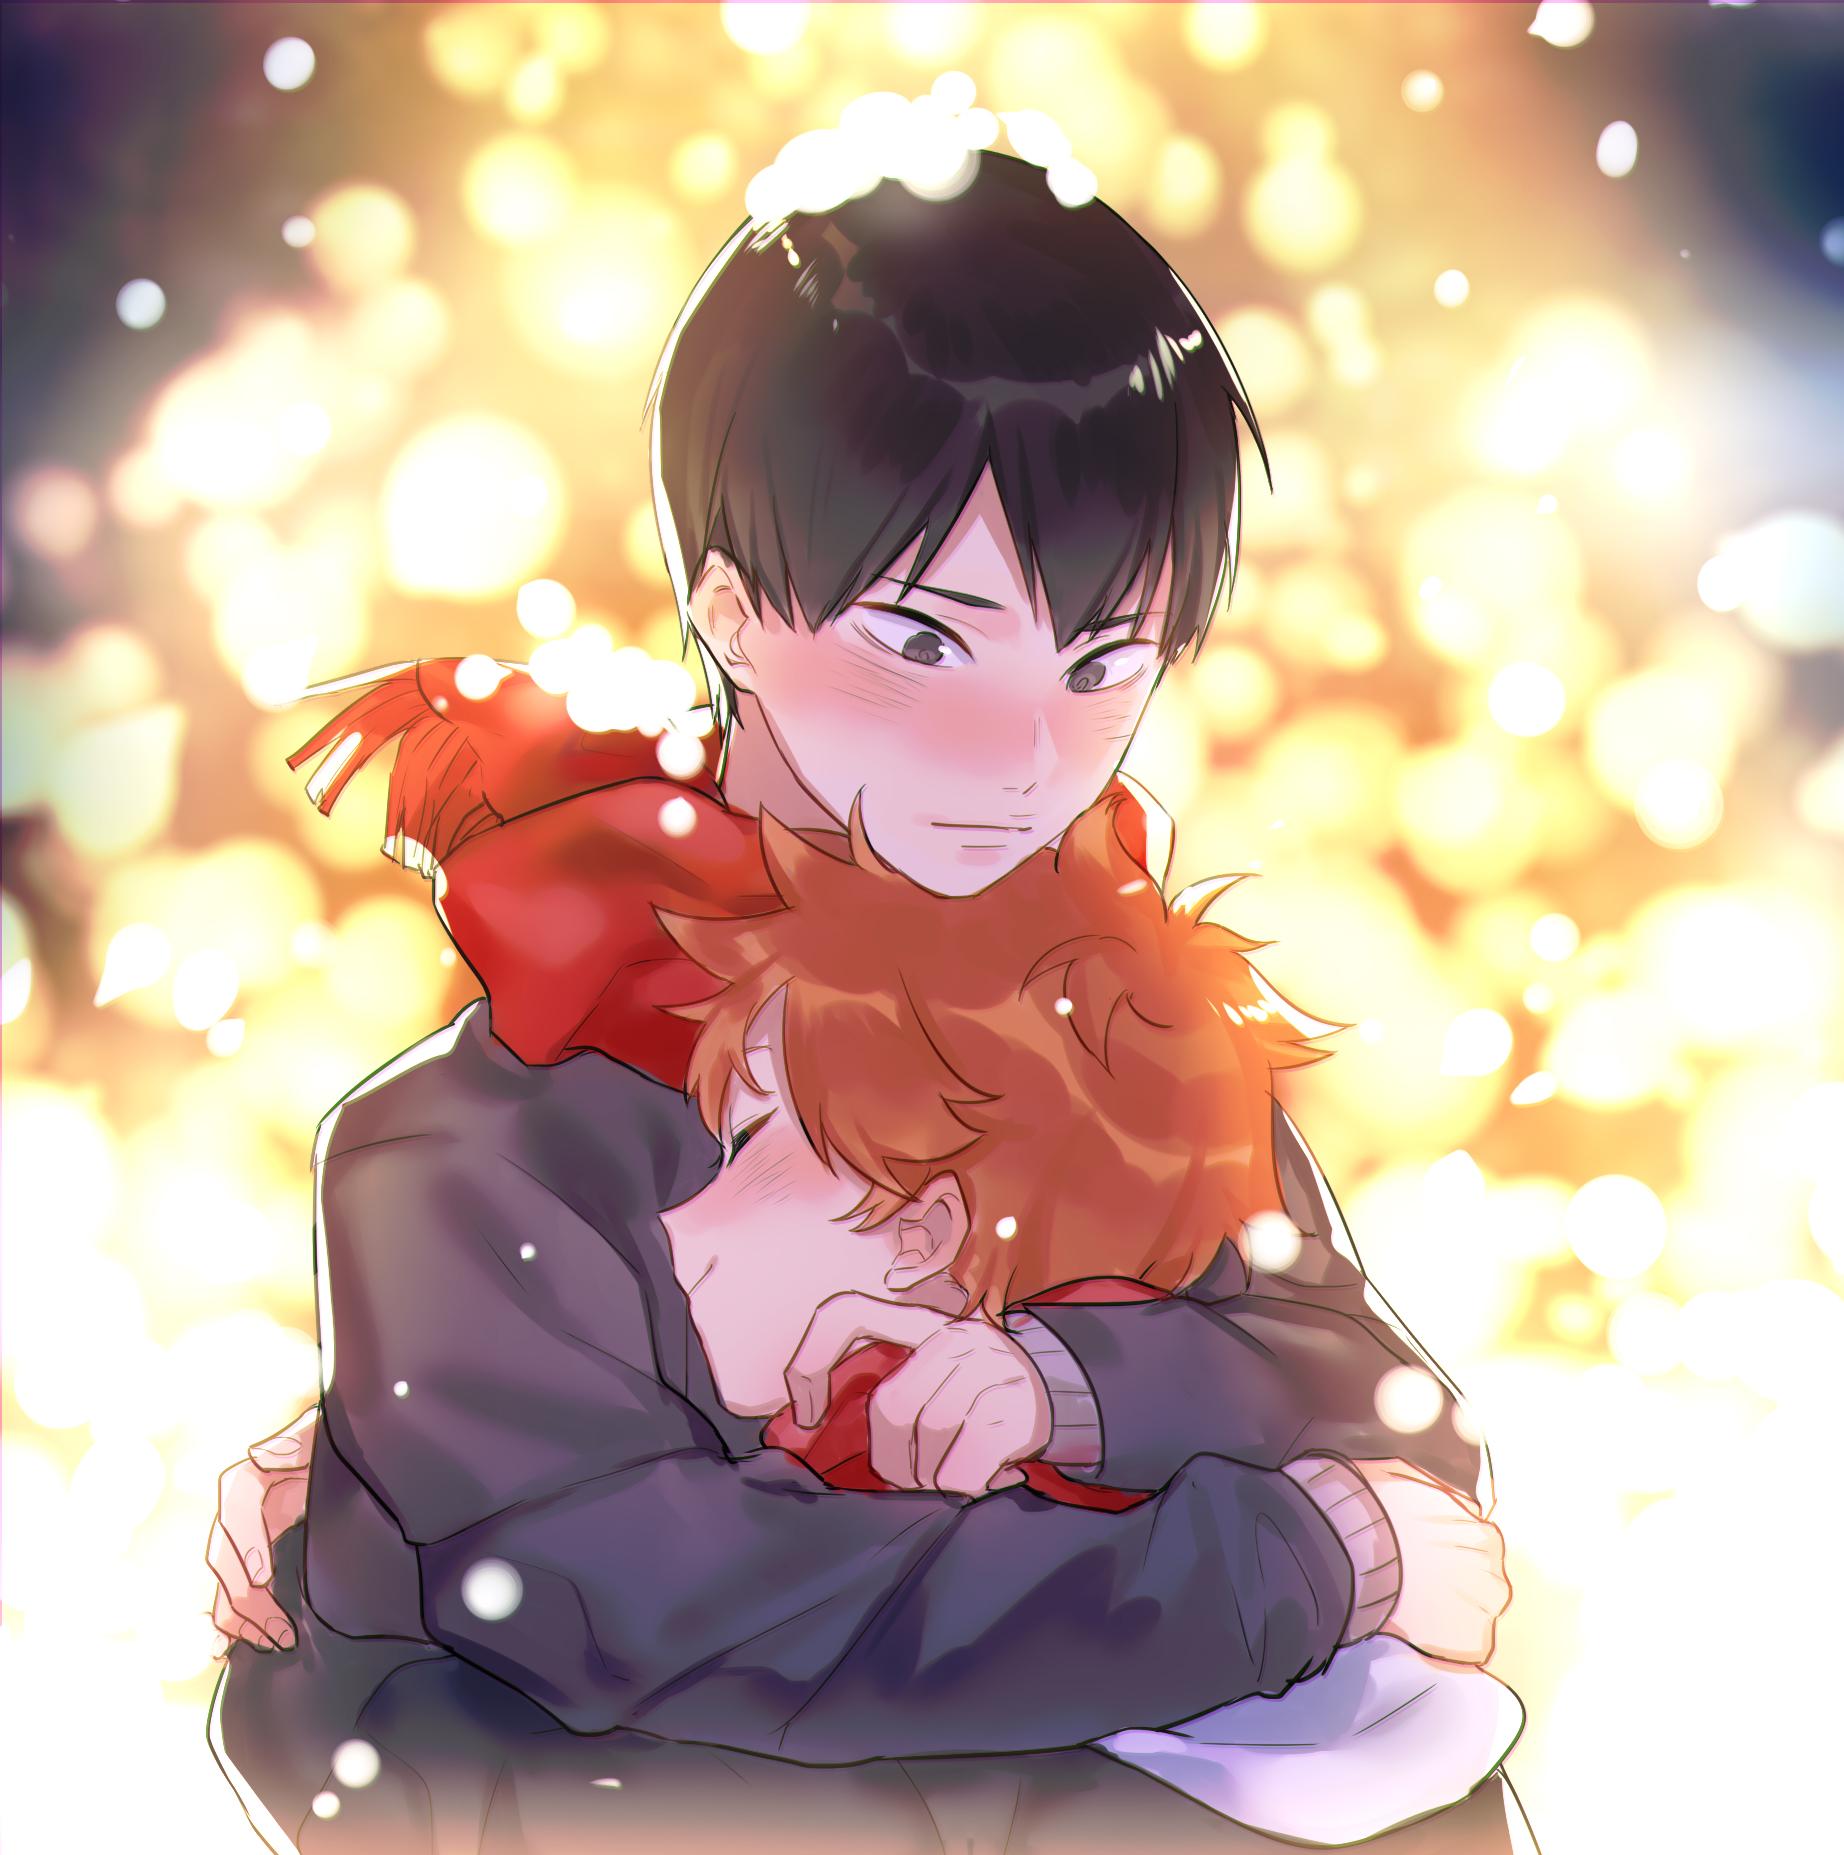 KageHina - Haikyuu!! - Image #2299298 - Zerochan Anime Image